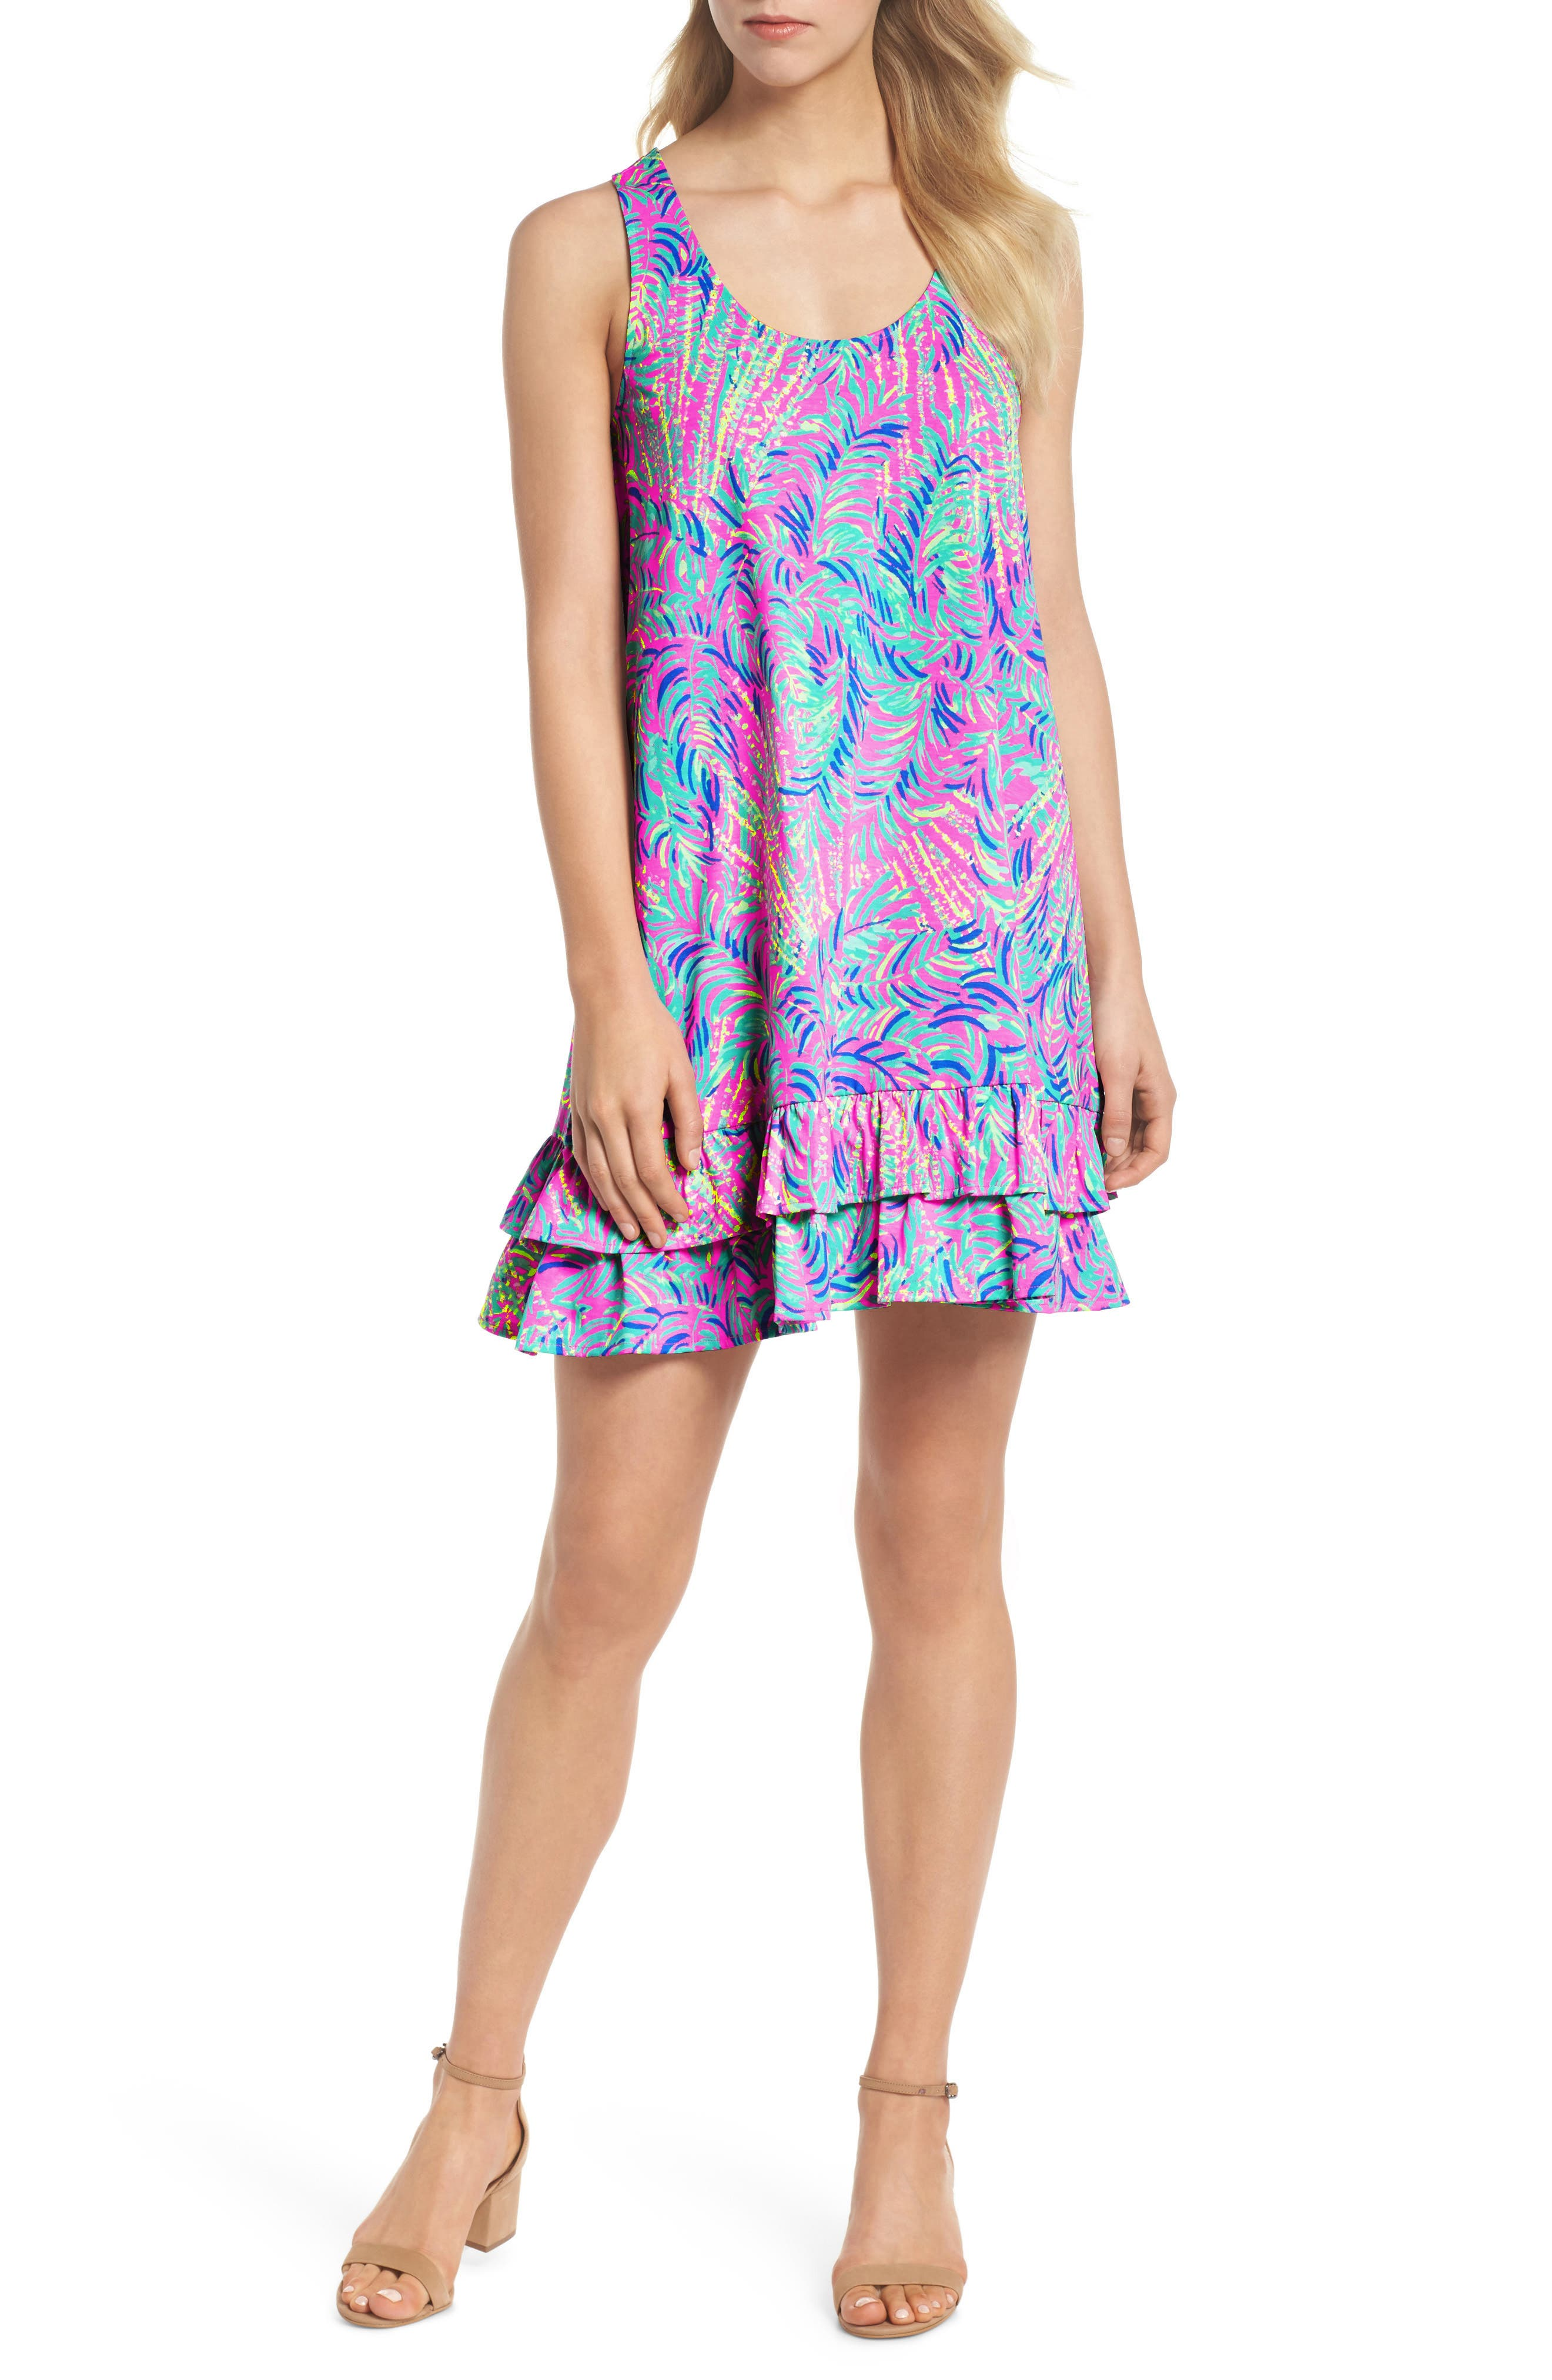 Alternate Image 1 Selected - Lilly Pulitzer® Evangelia Sleeveless Racerback Dress